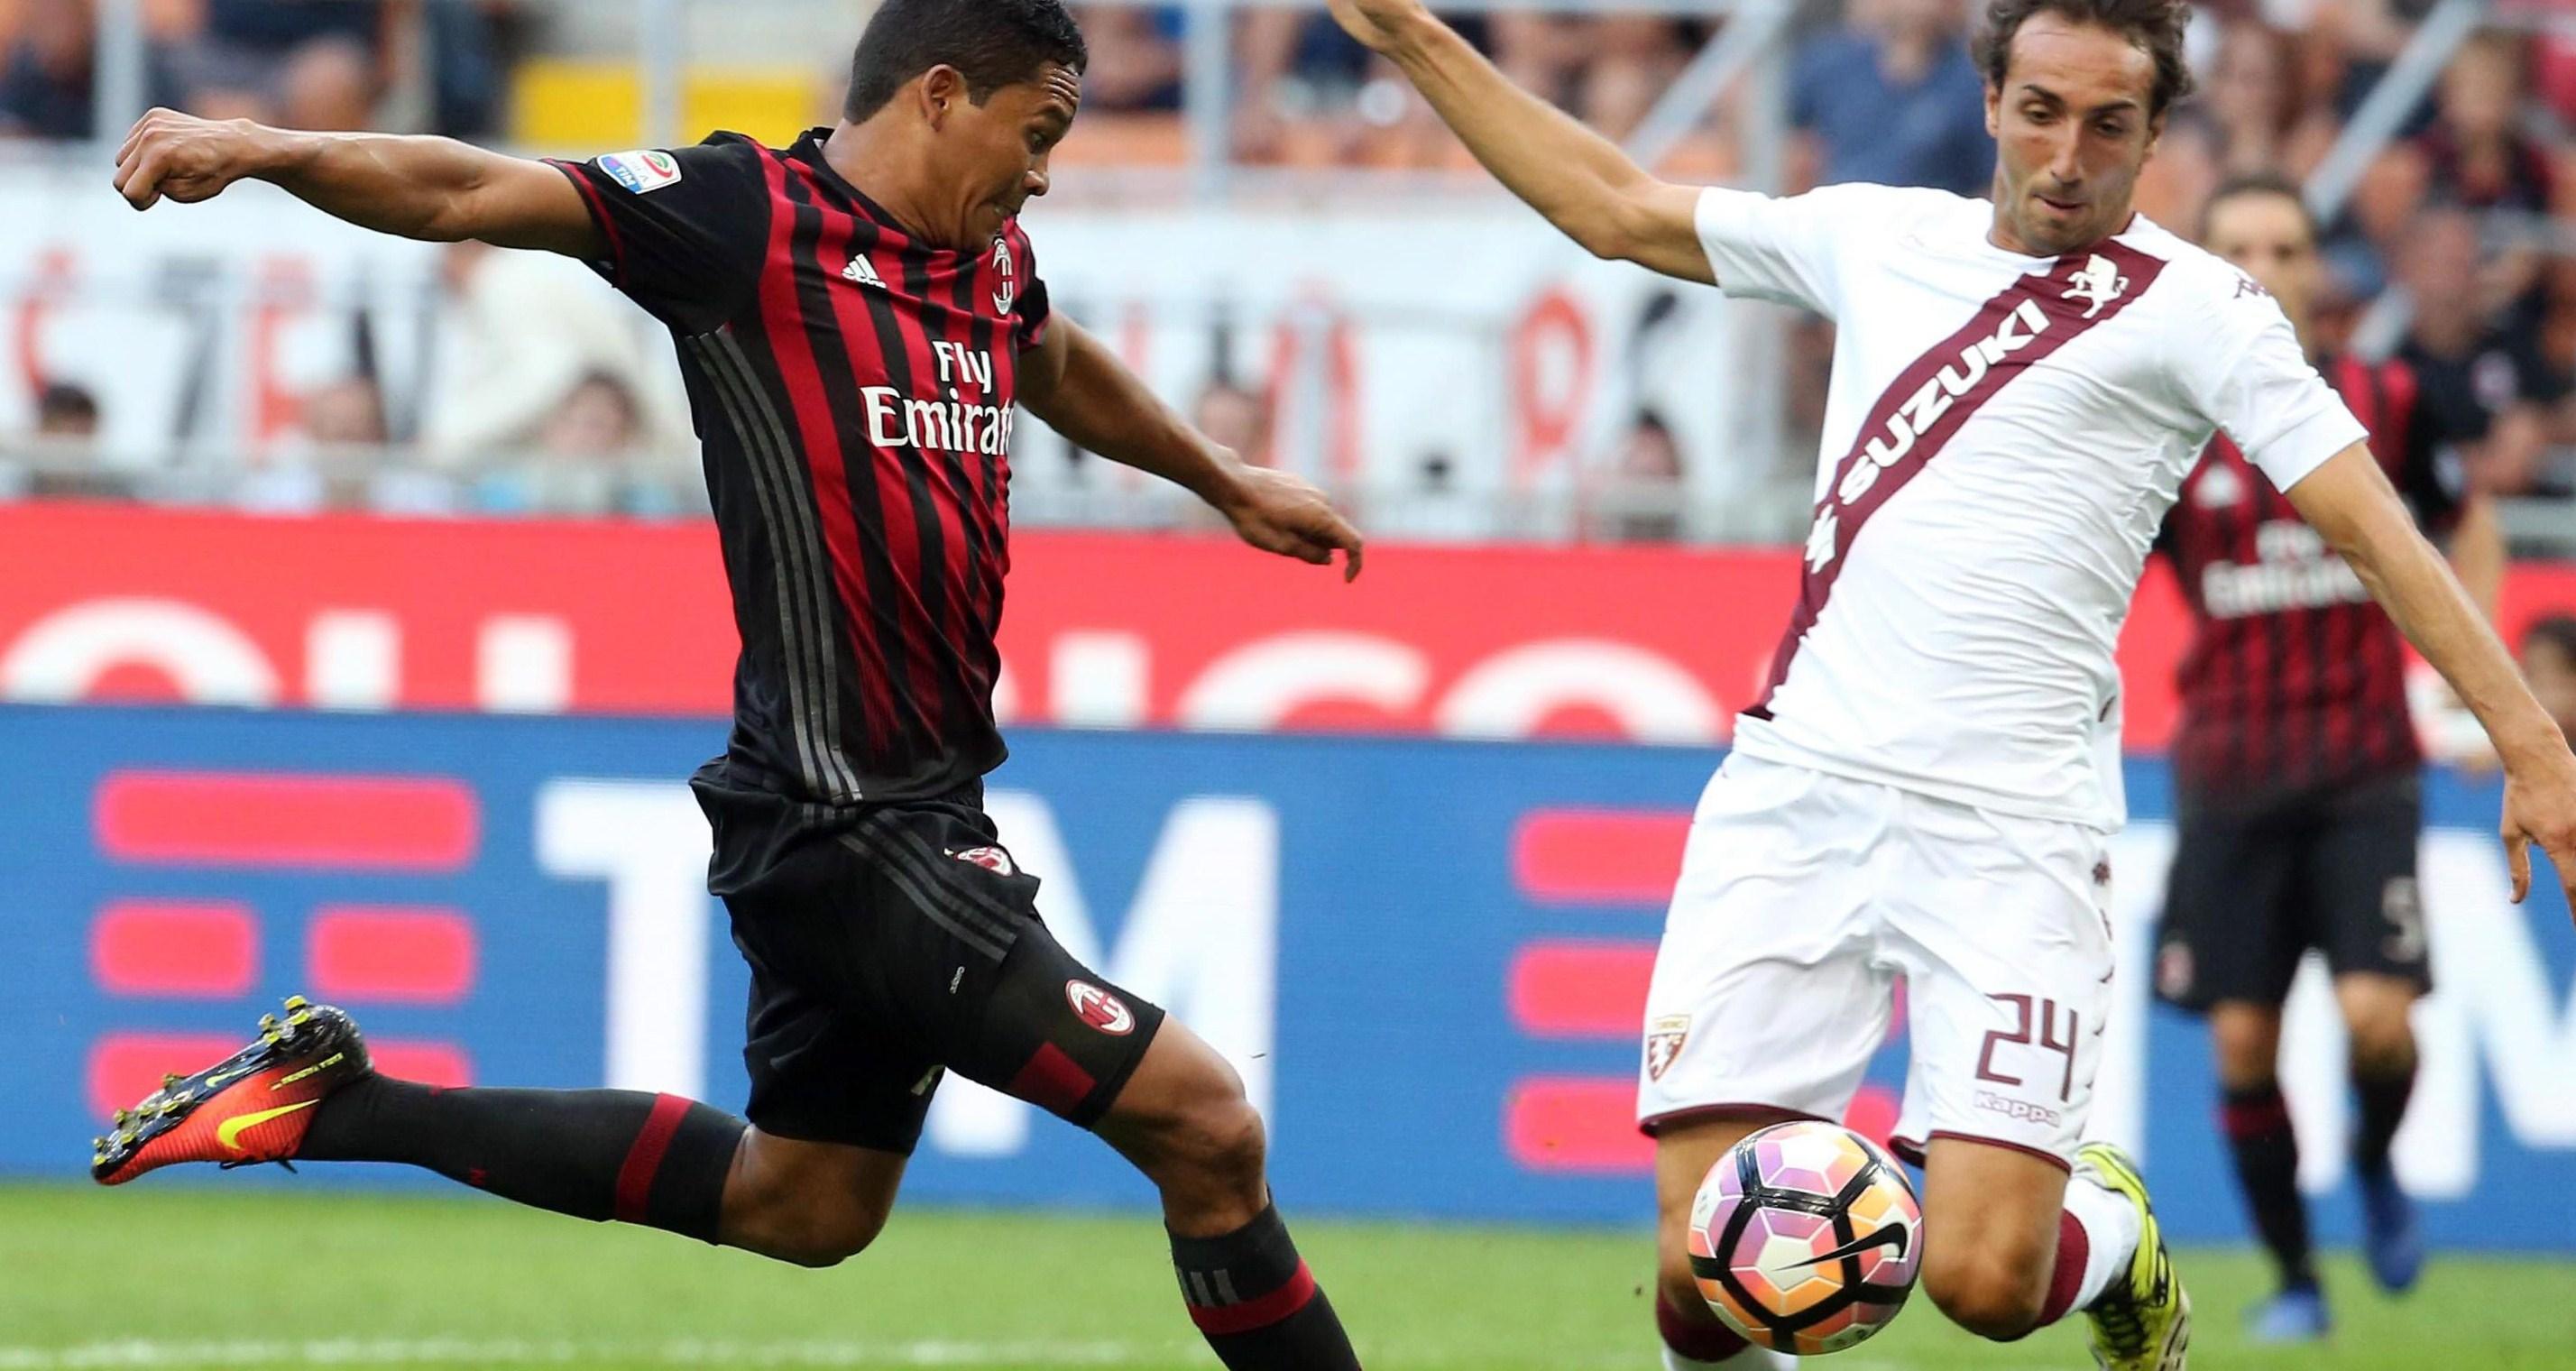 Con tres goles de Bacca el Milan venció al Torino de  Josef Martínez